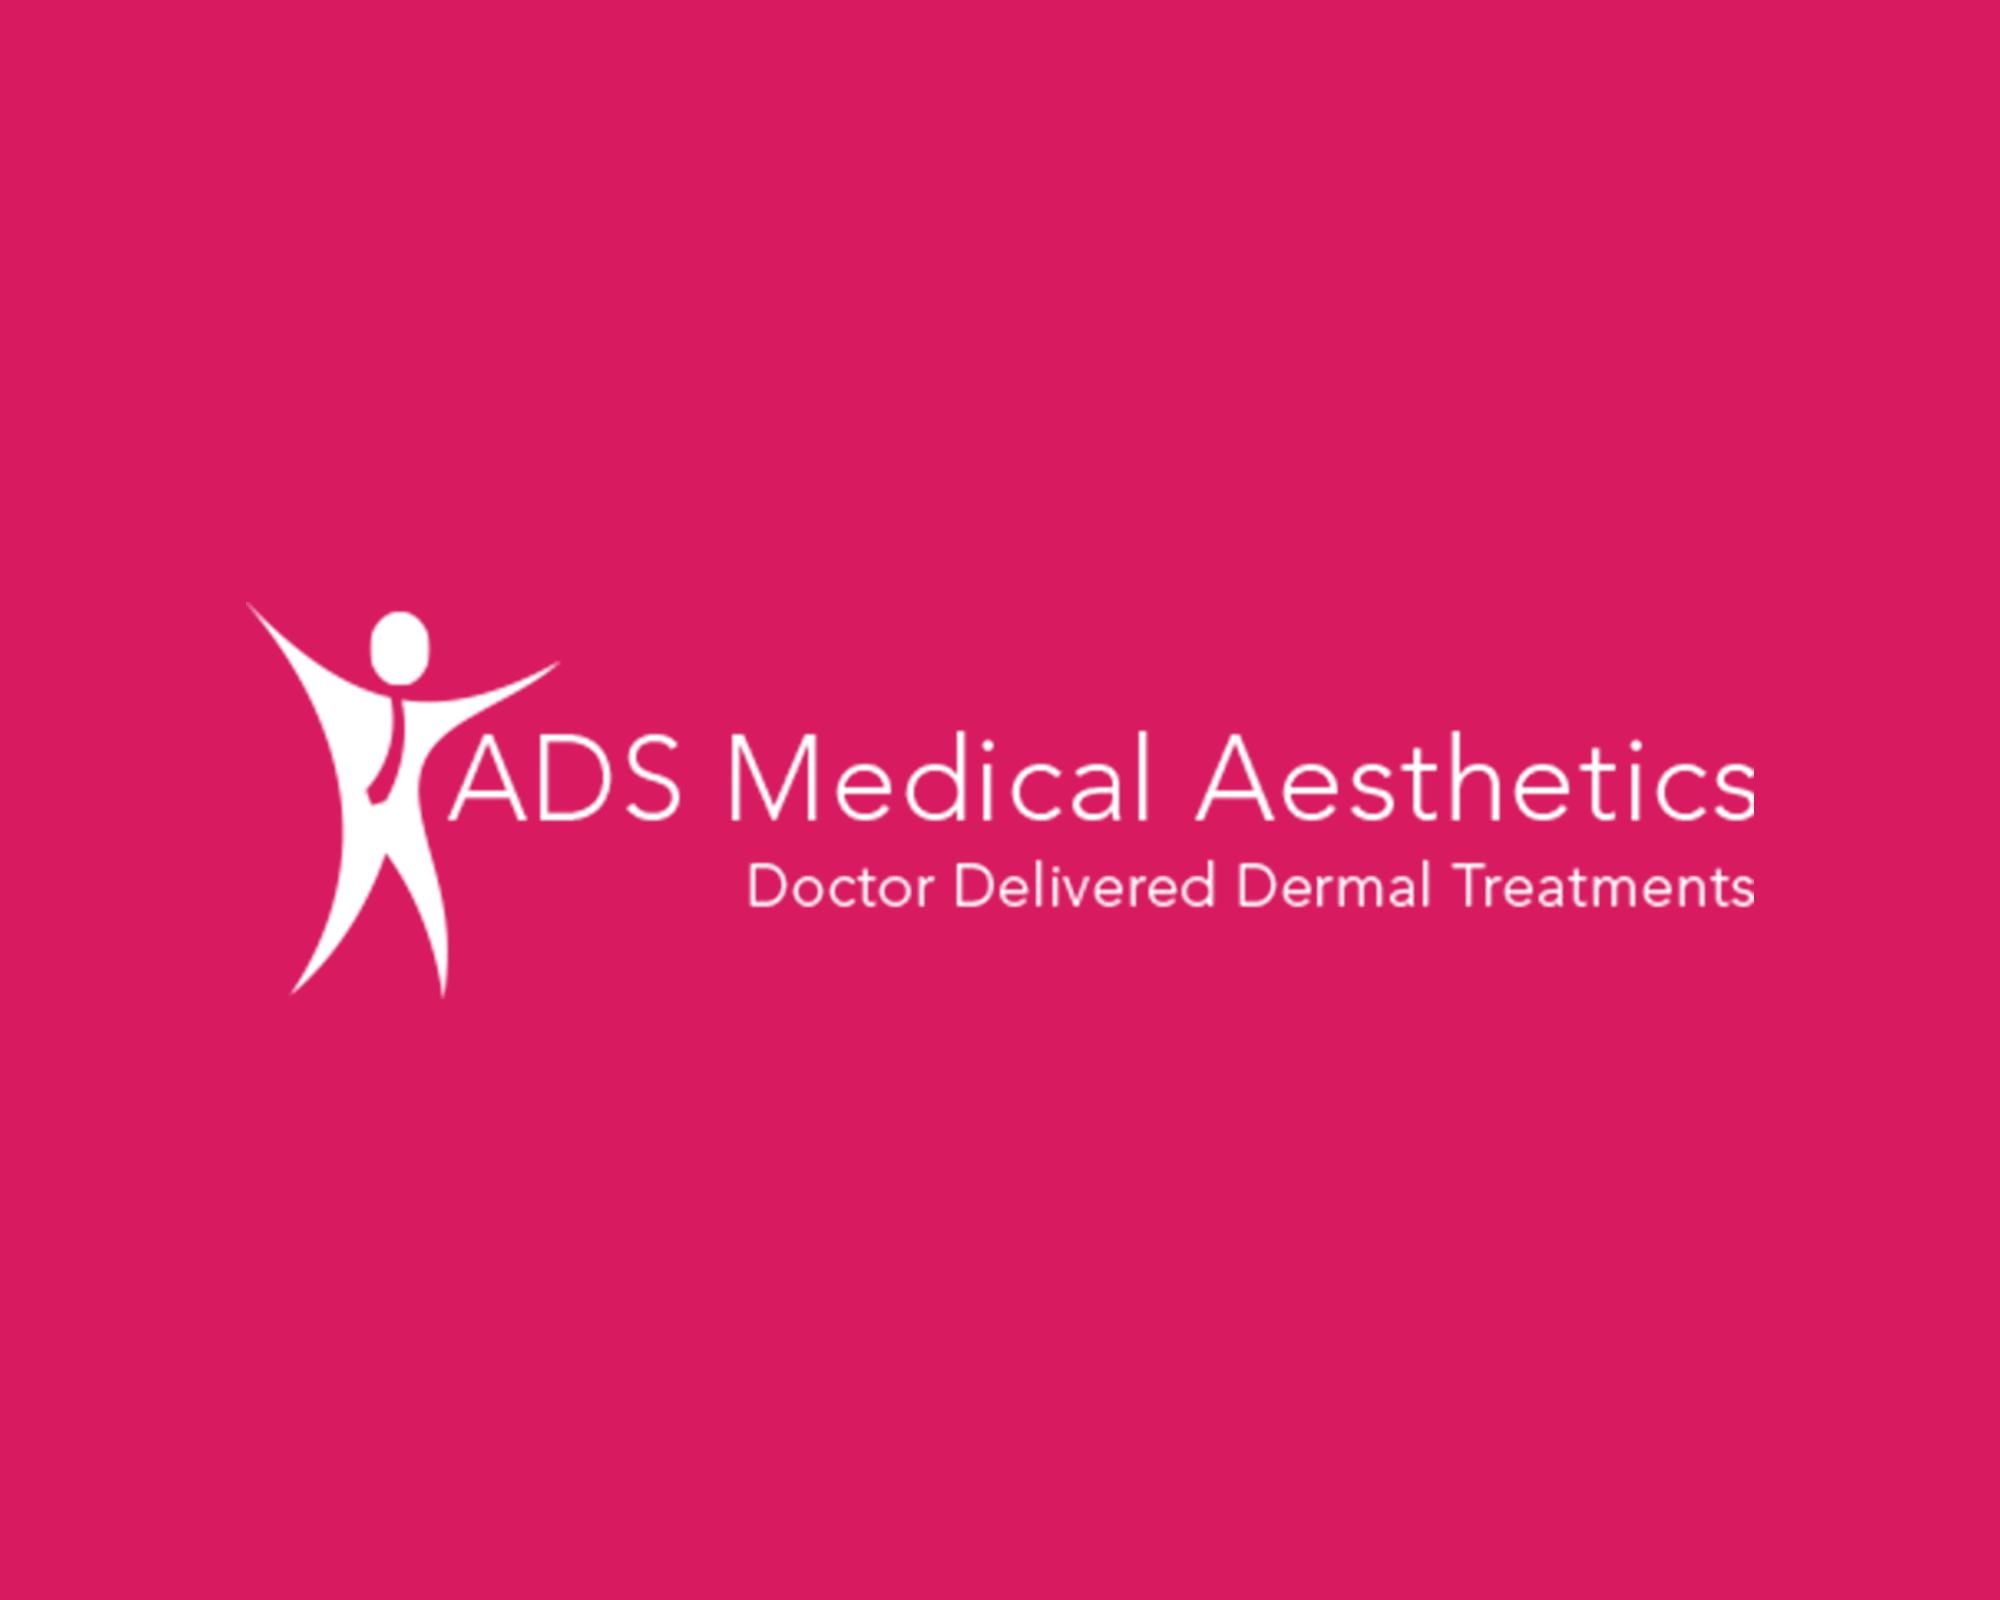 ads medical aesthetics Logo